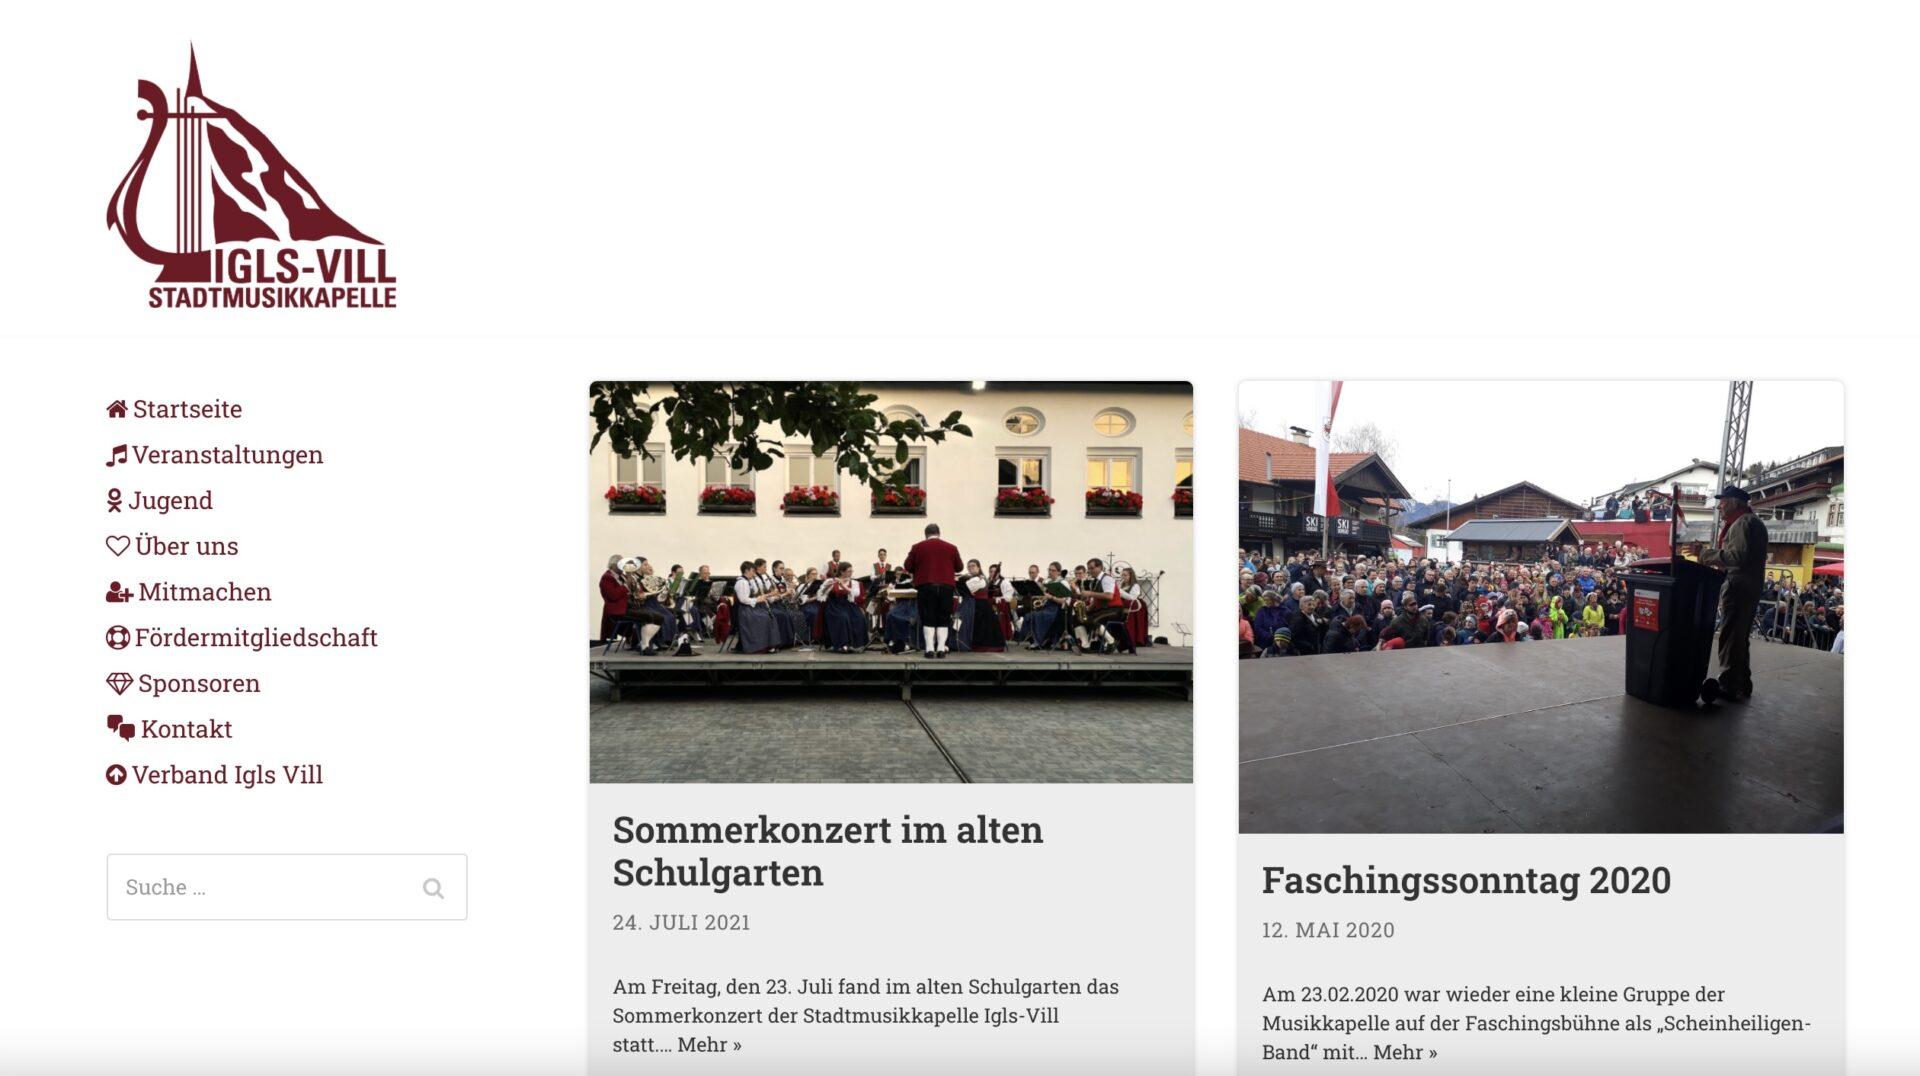 Webseite der Stadtmusikkapelle Igls Vill